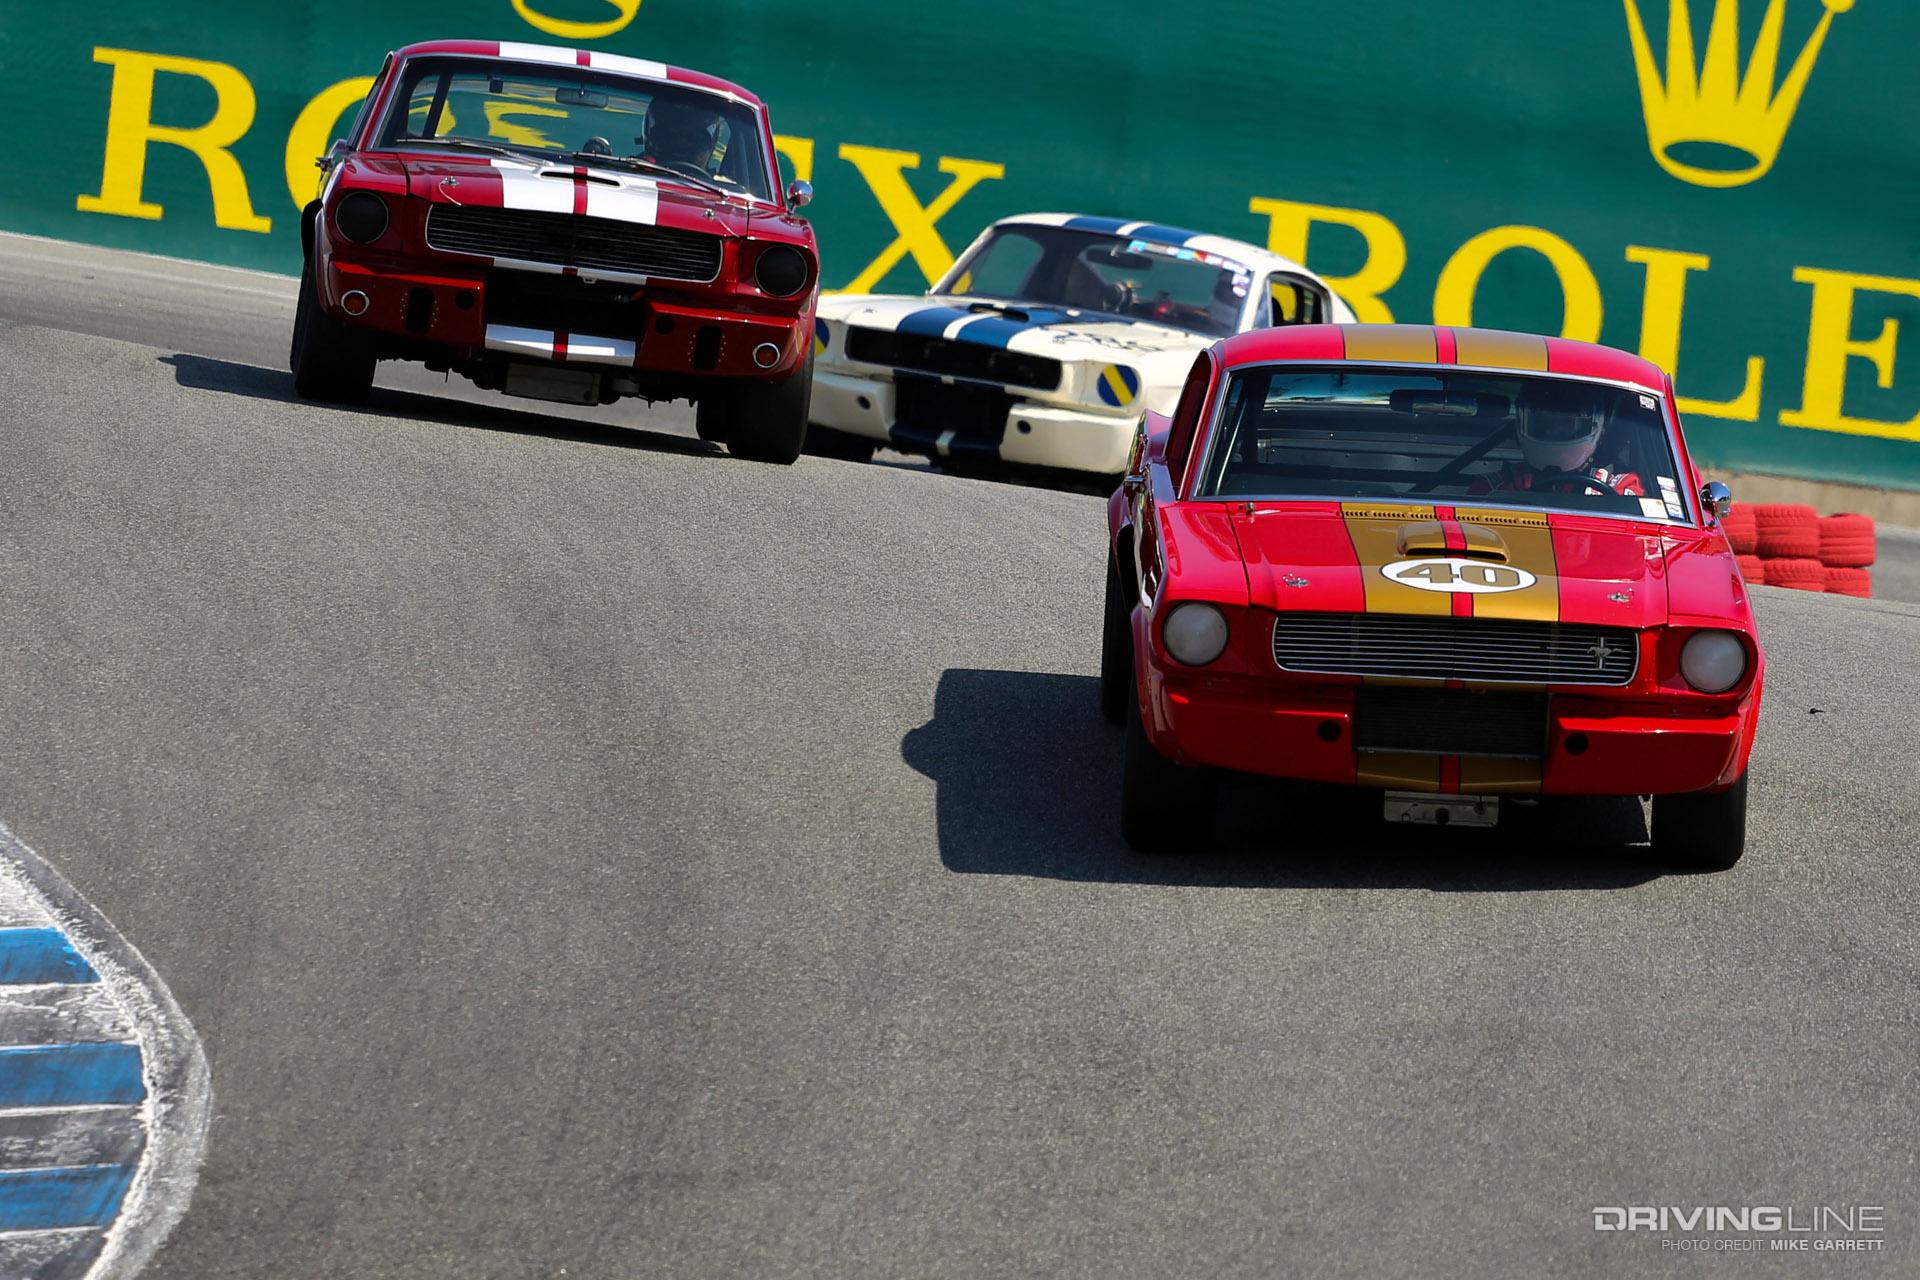 Vintage Racing Overload at the 2017 Rolex Monterey Motorsport ...